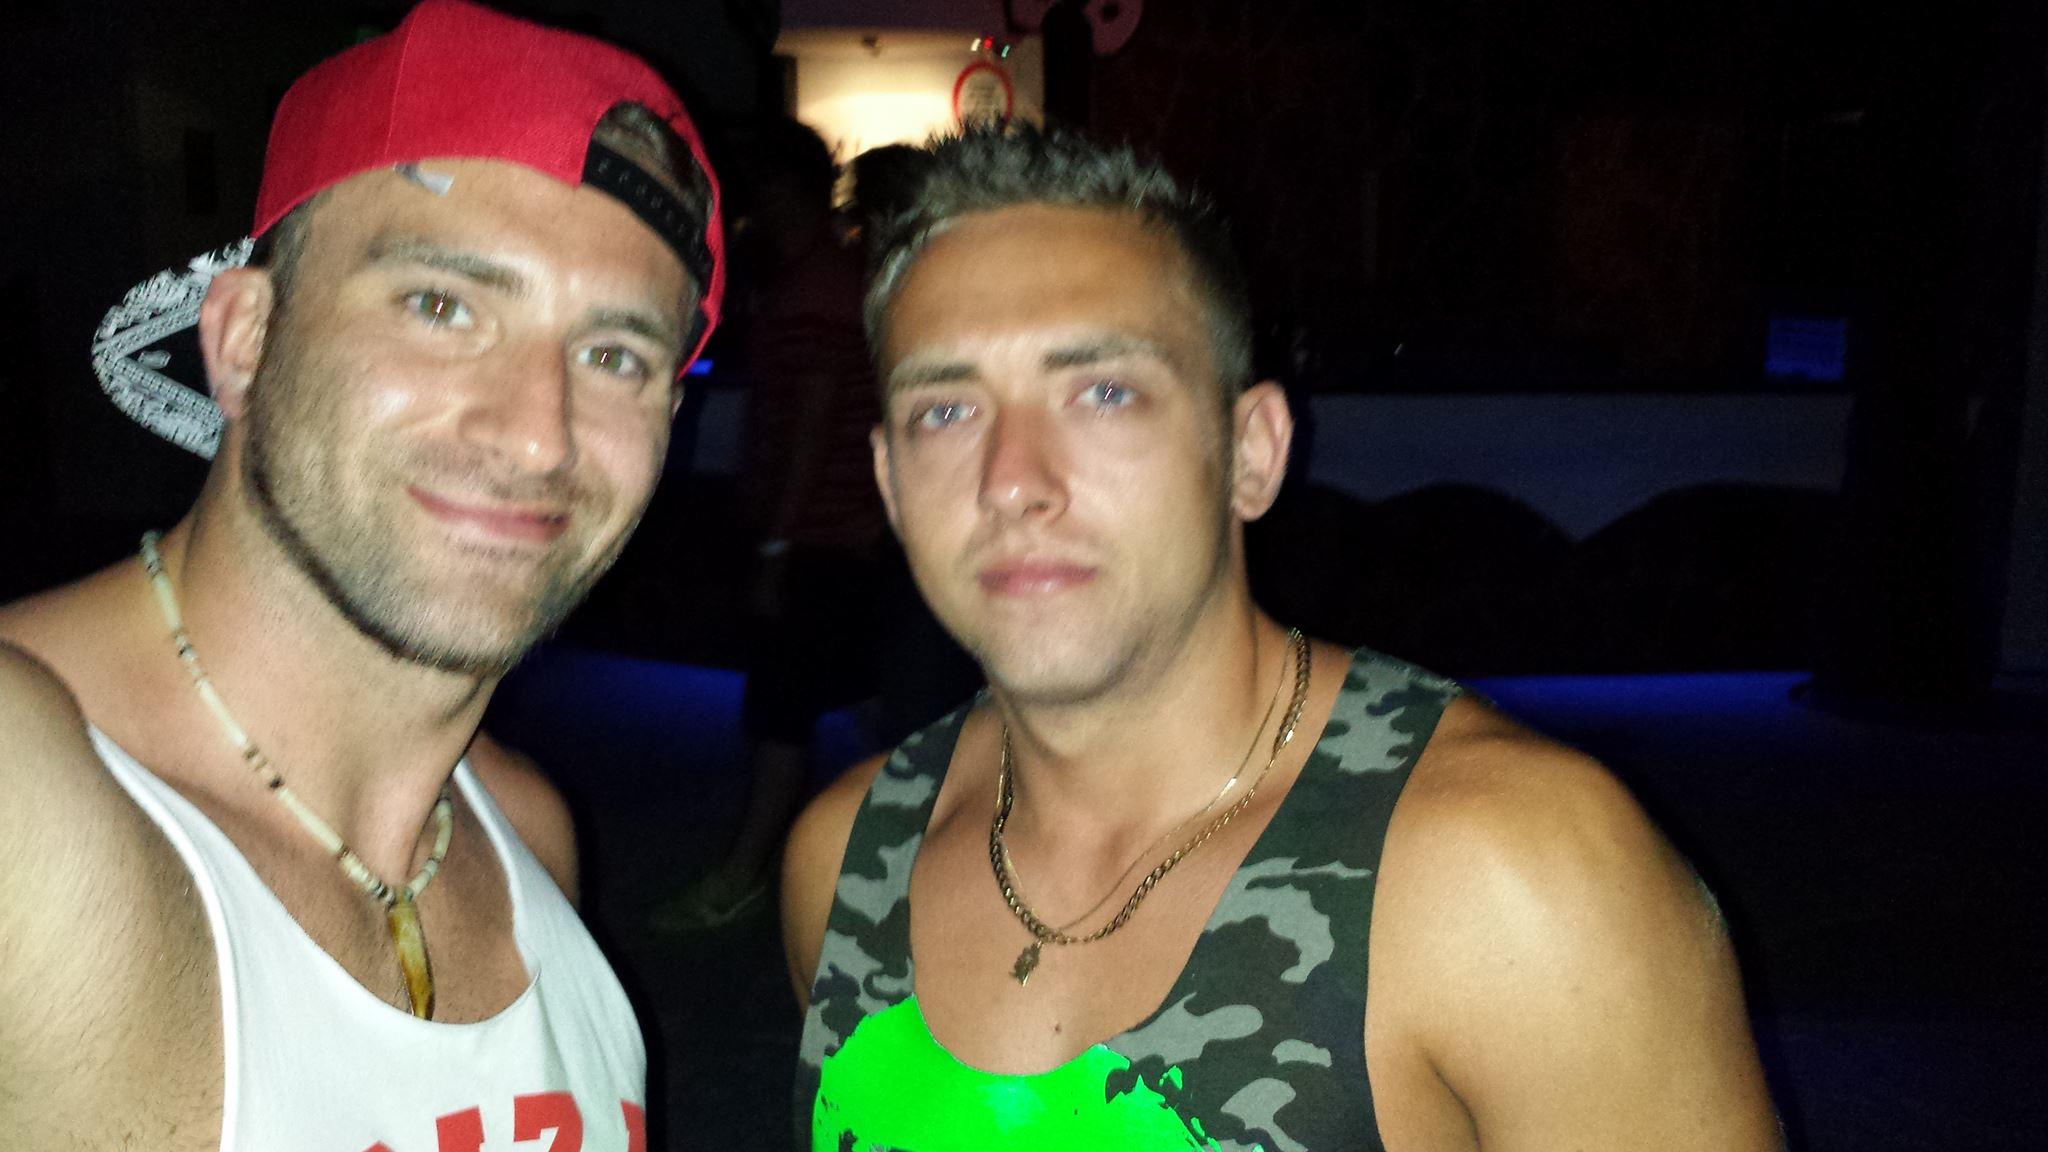 Mike Braun & Christopher Birner